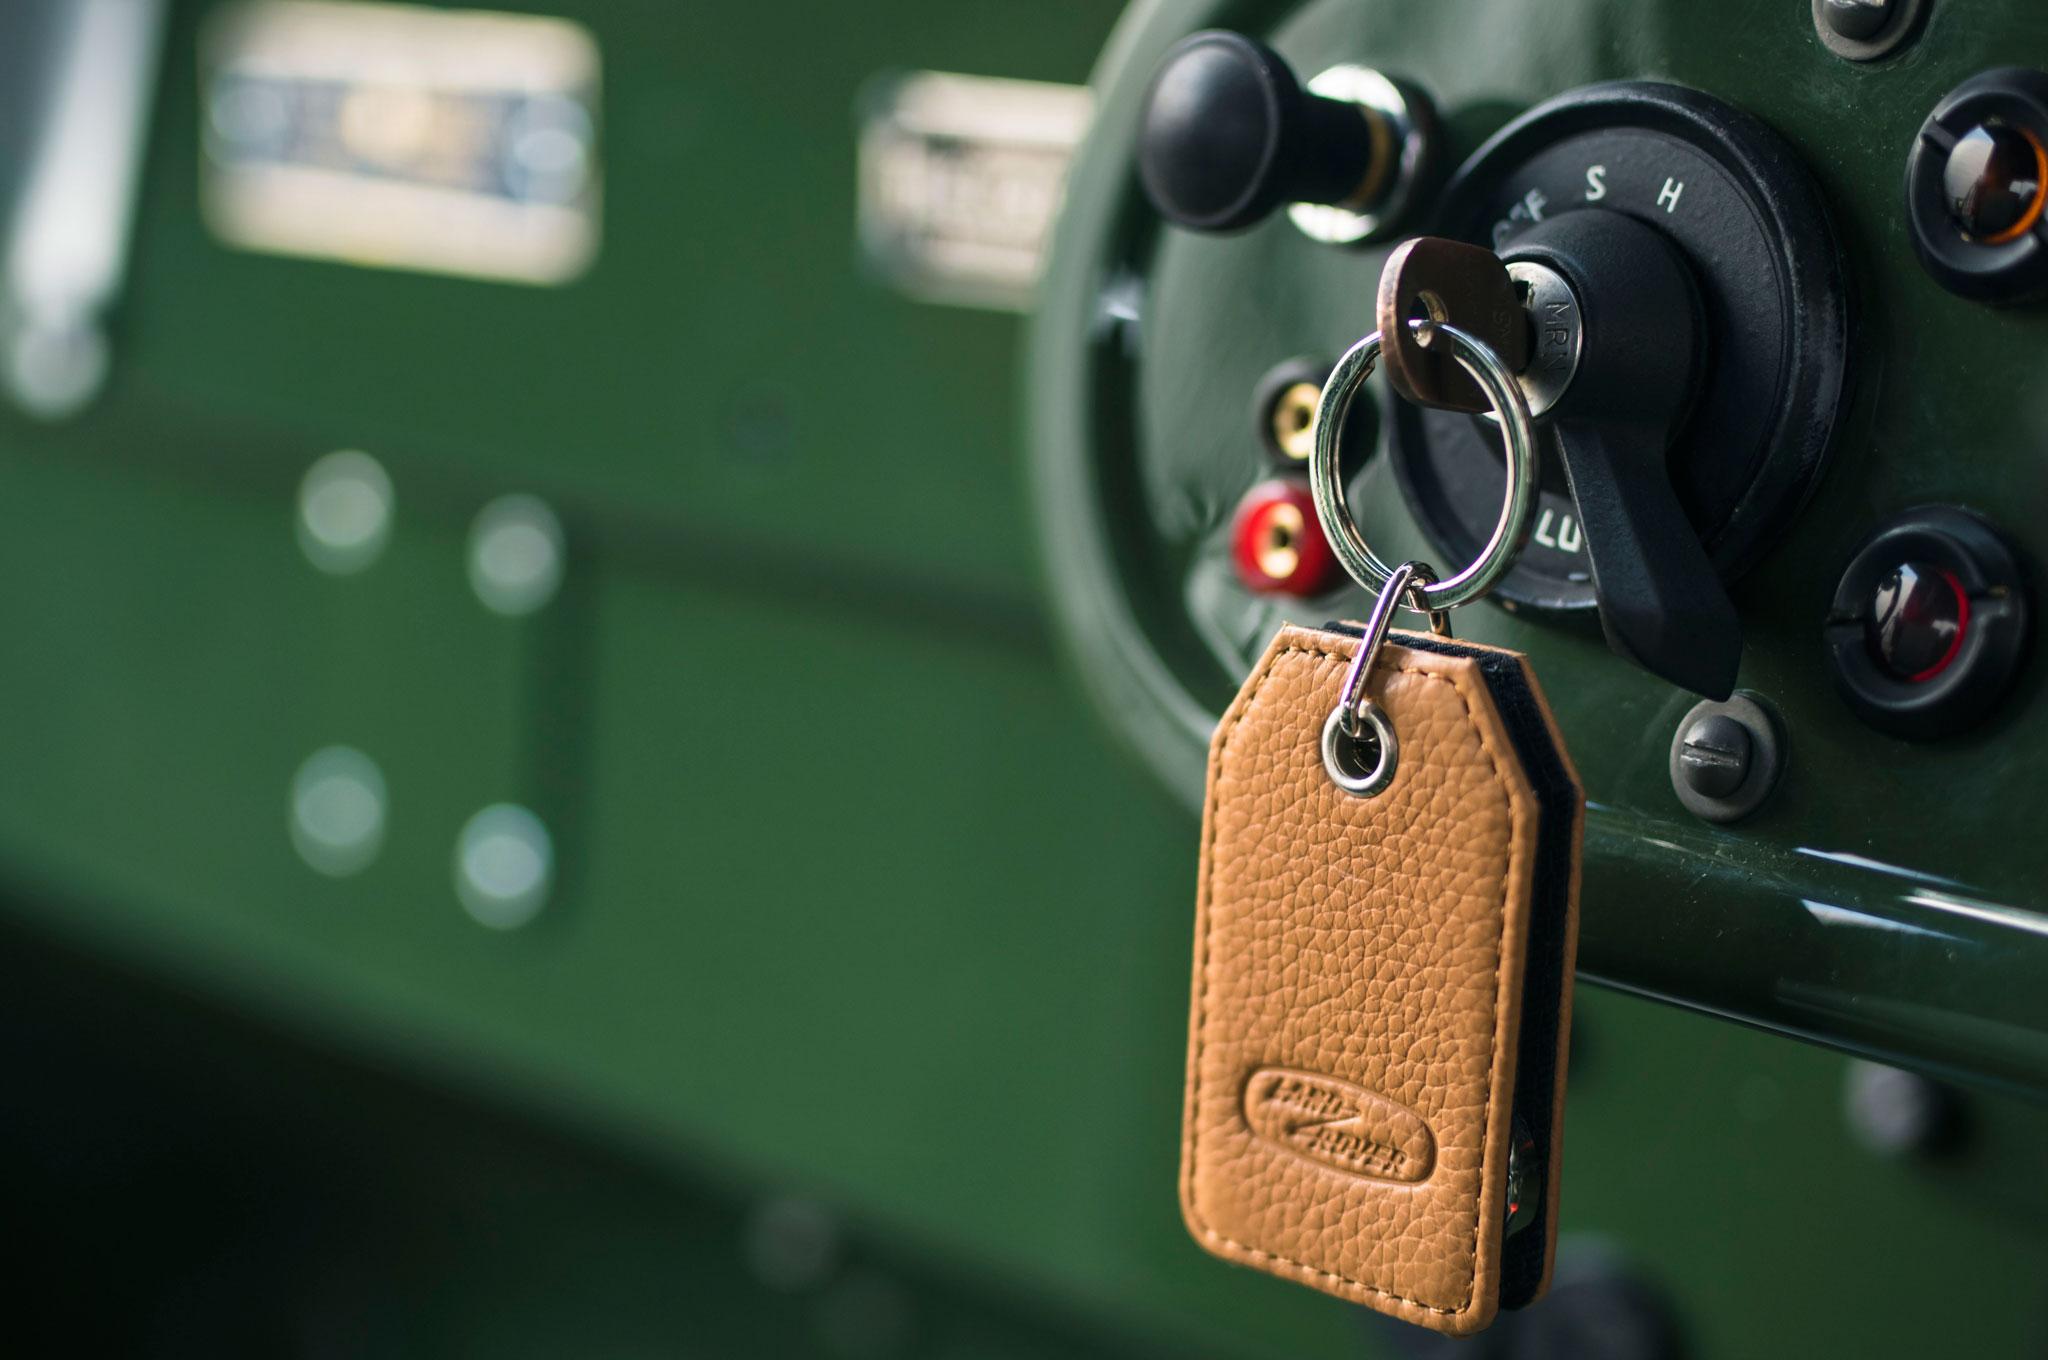 1948 land rover series i reborn key switch